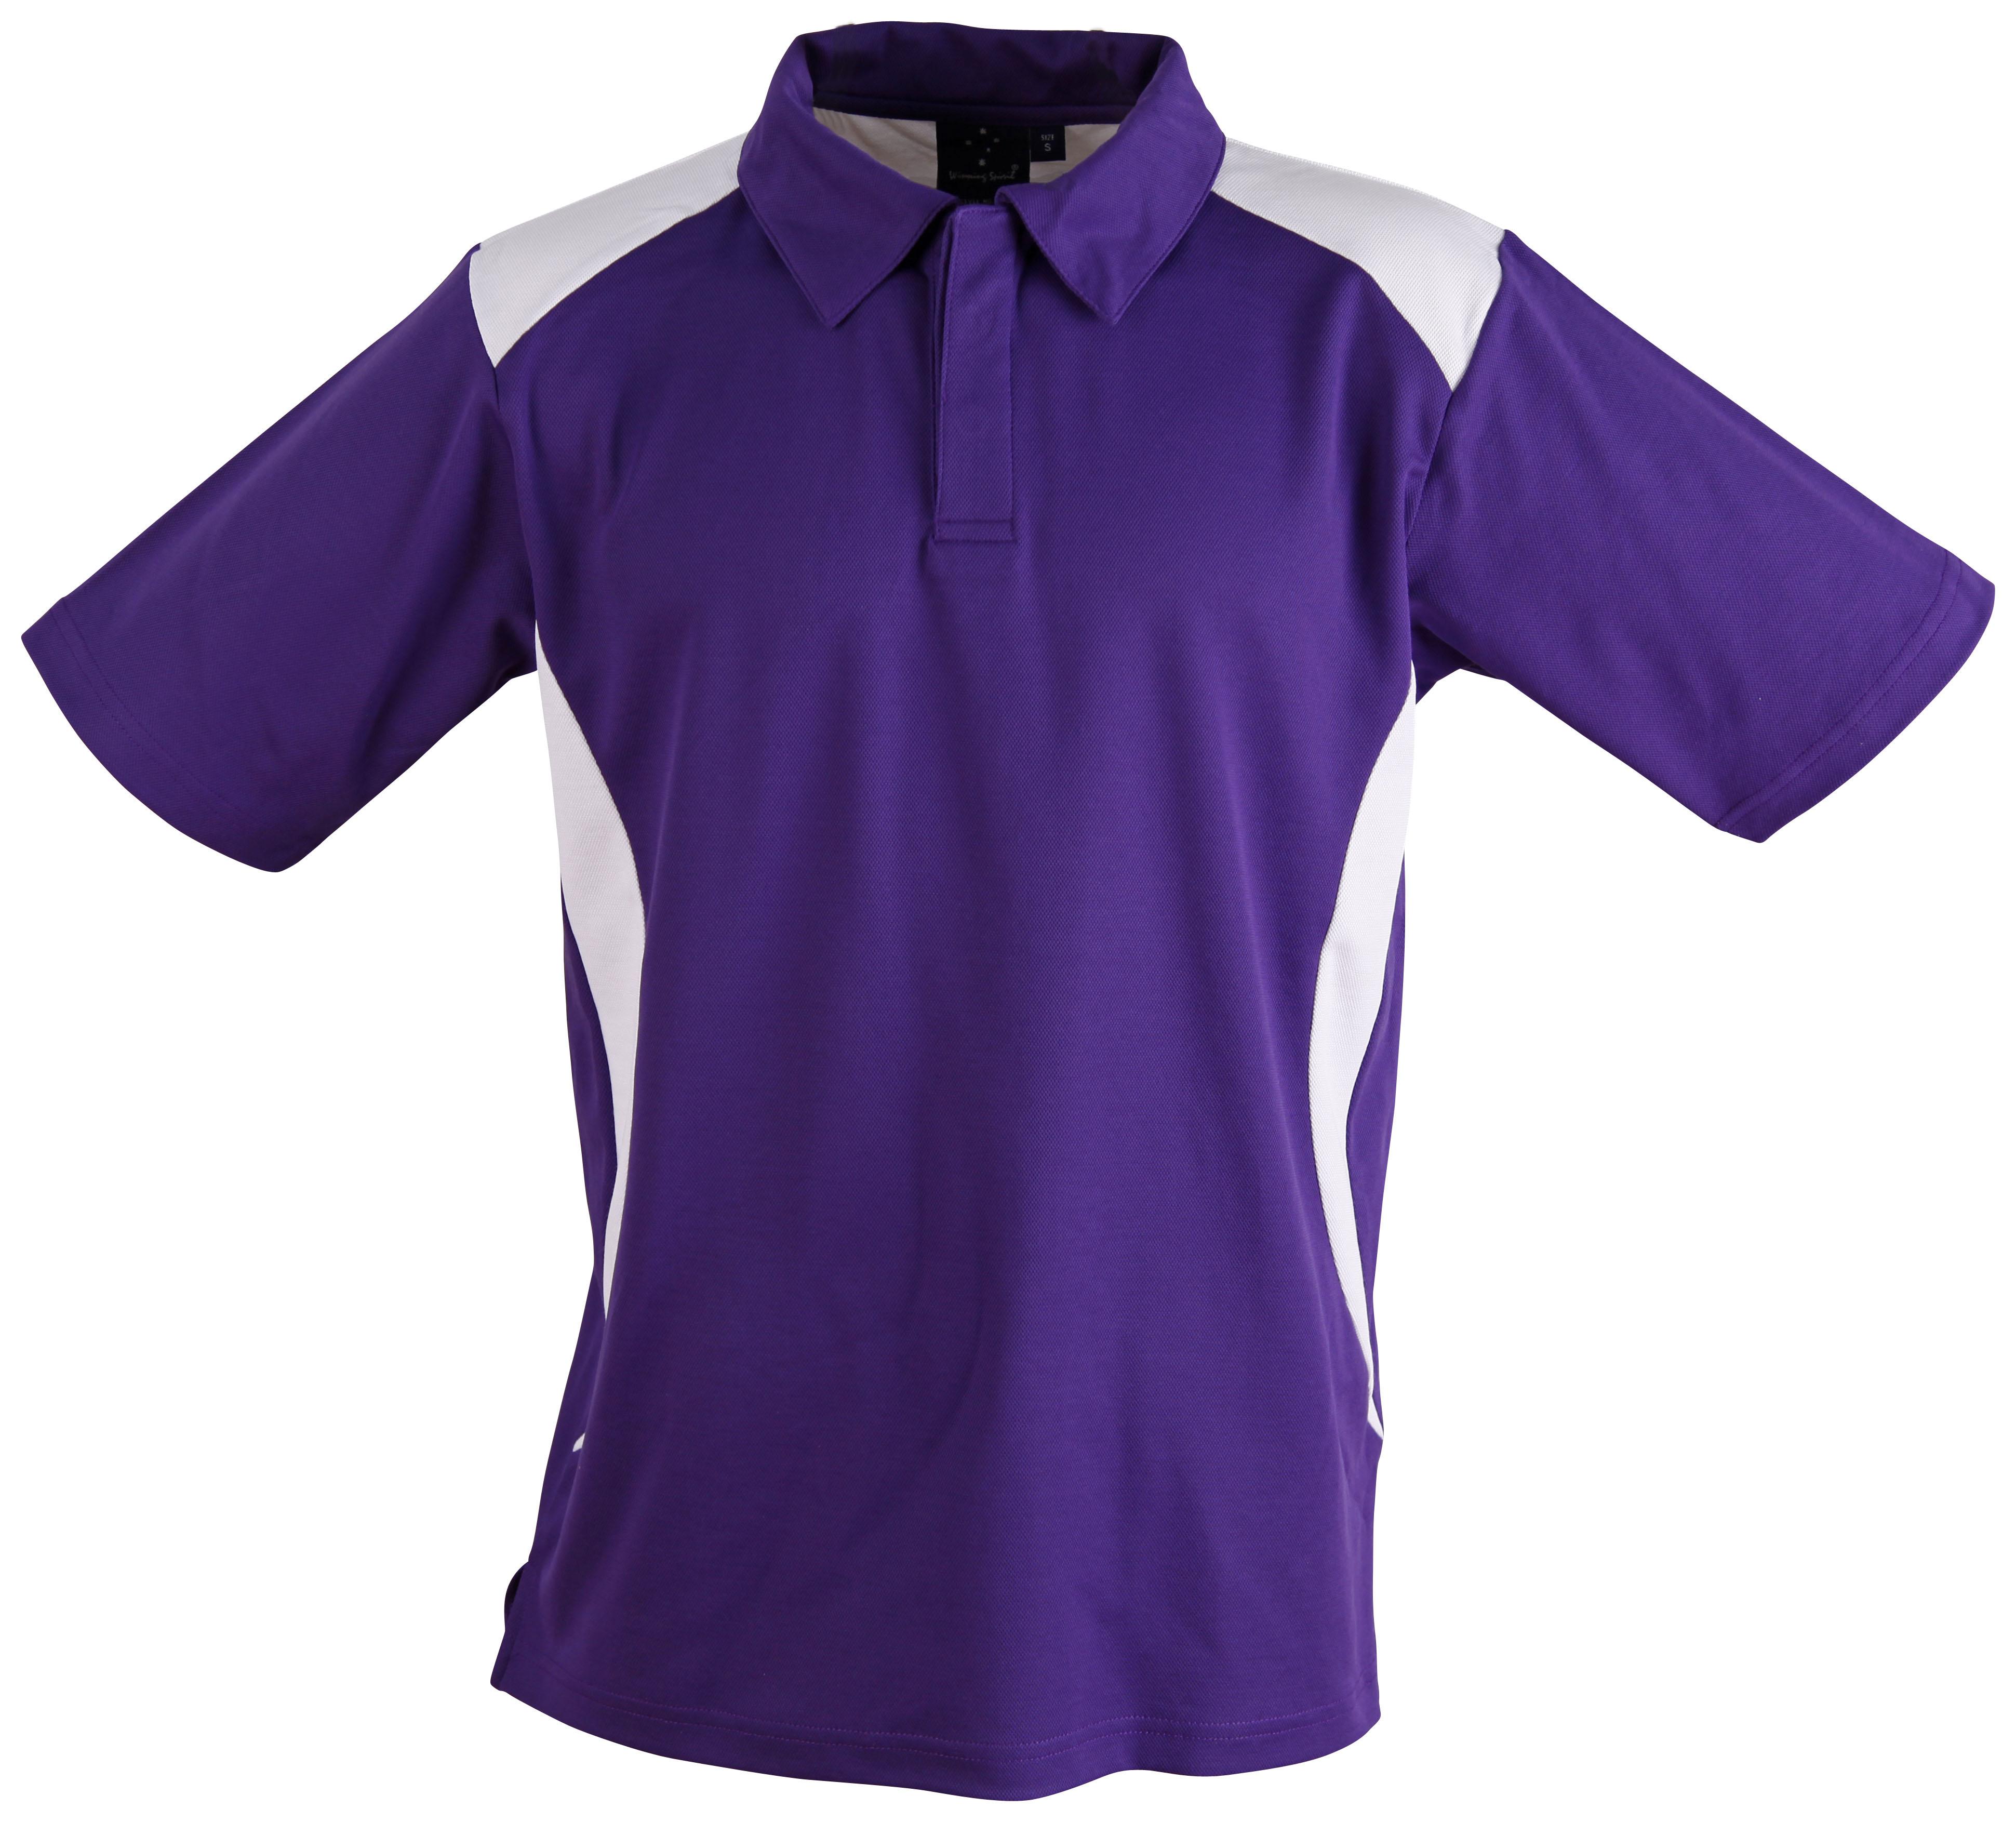 Stubbies Children Kids School Wear Short Sleeve Polo Shirt sz 4 Colour Sky